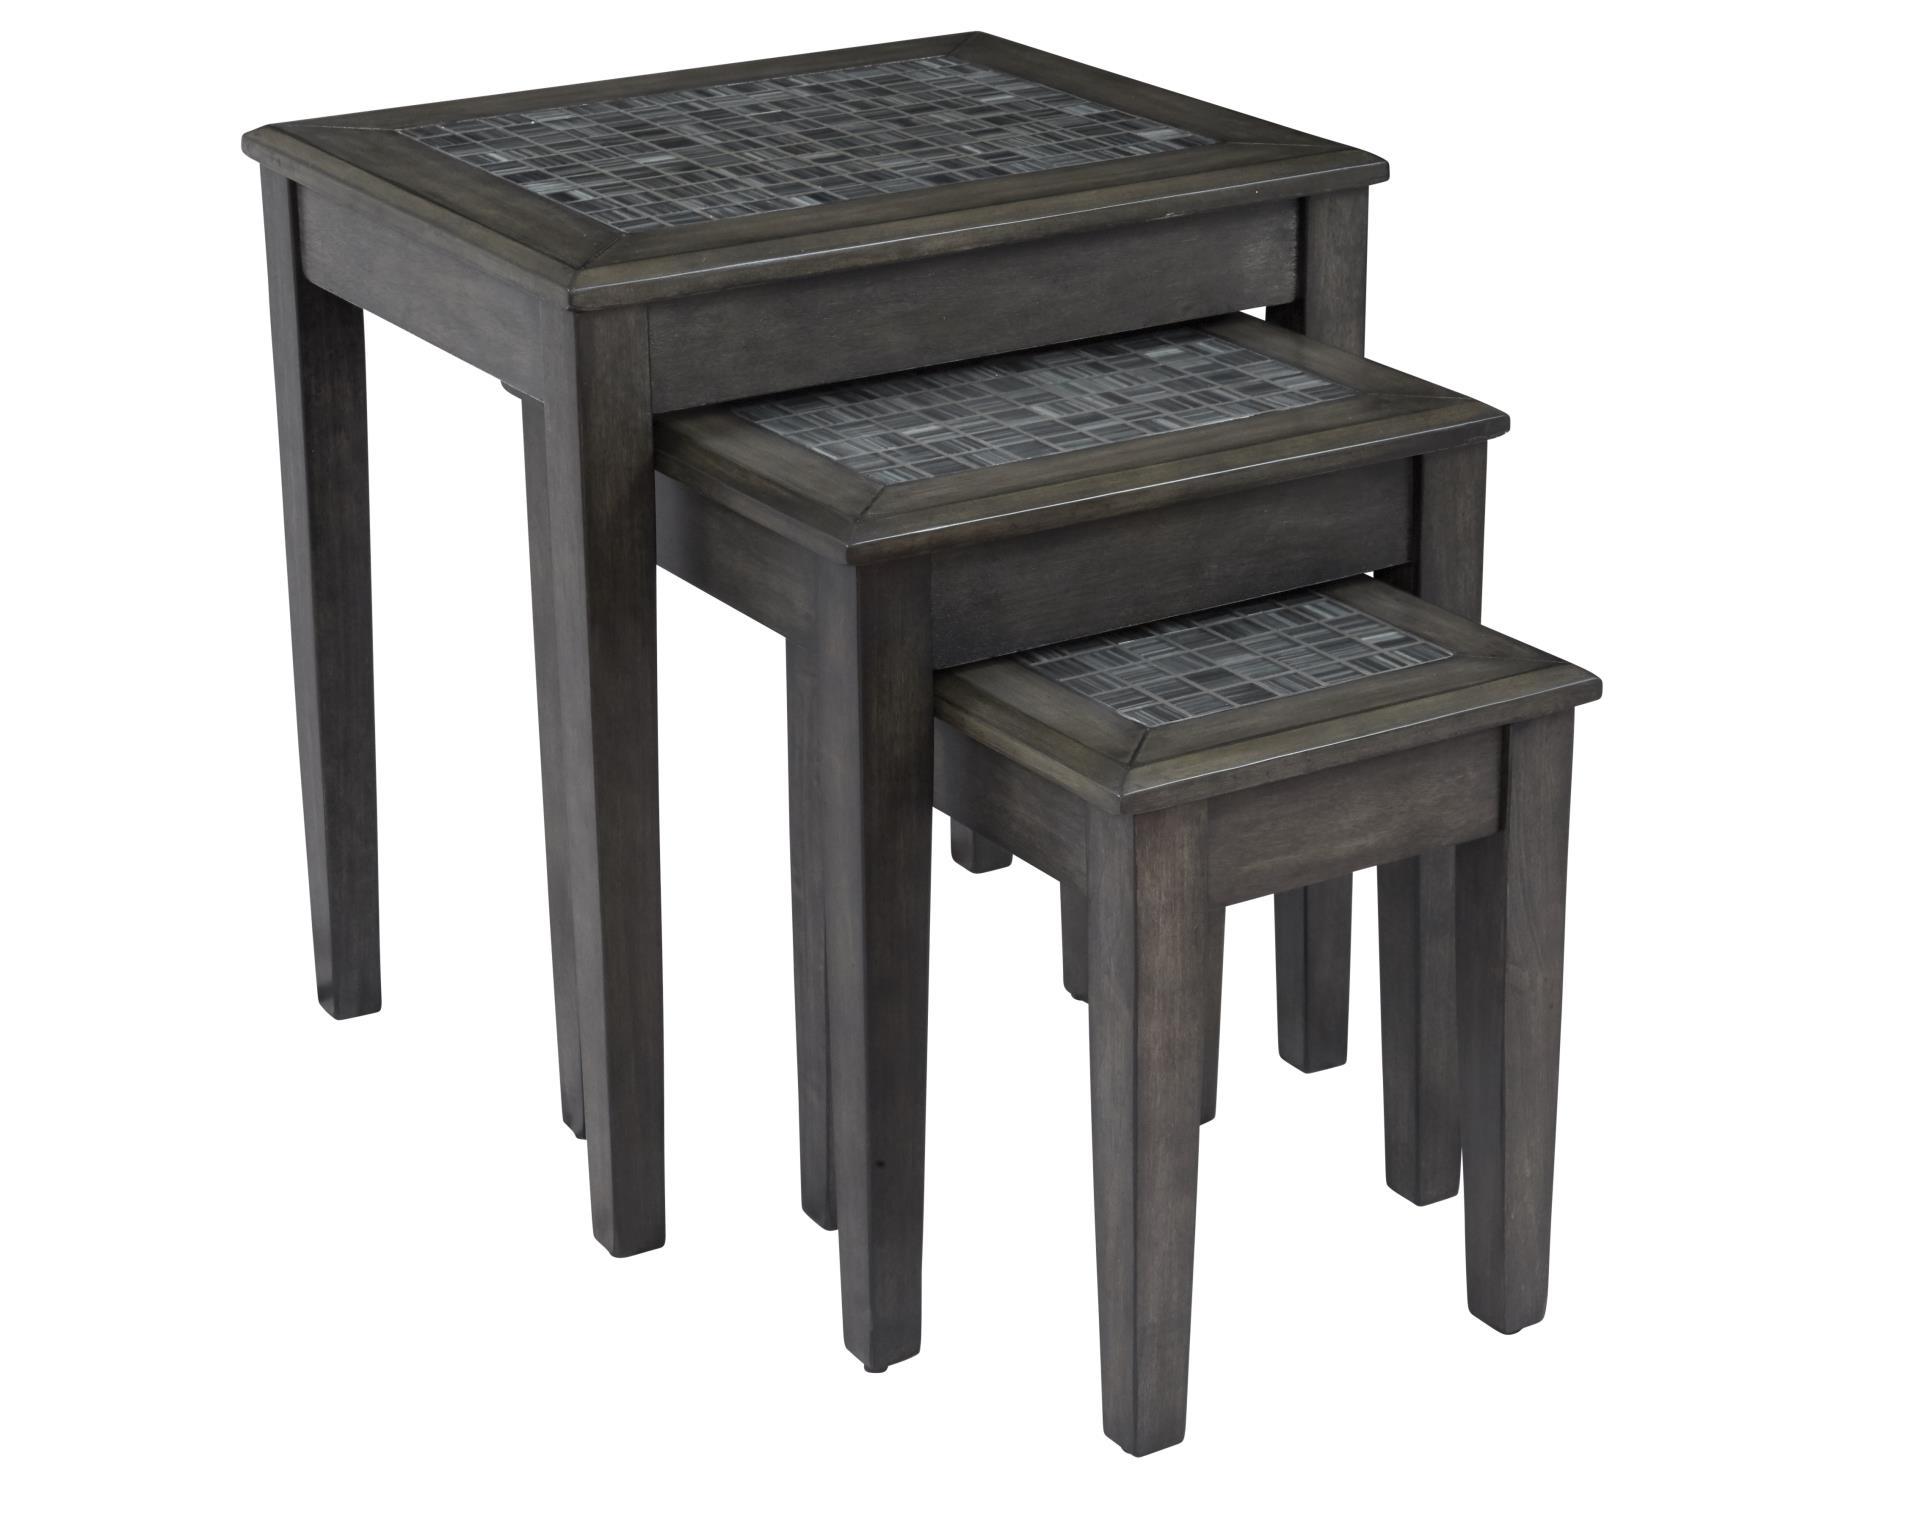 Grey Mosaic Nesting Tables Image